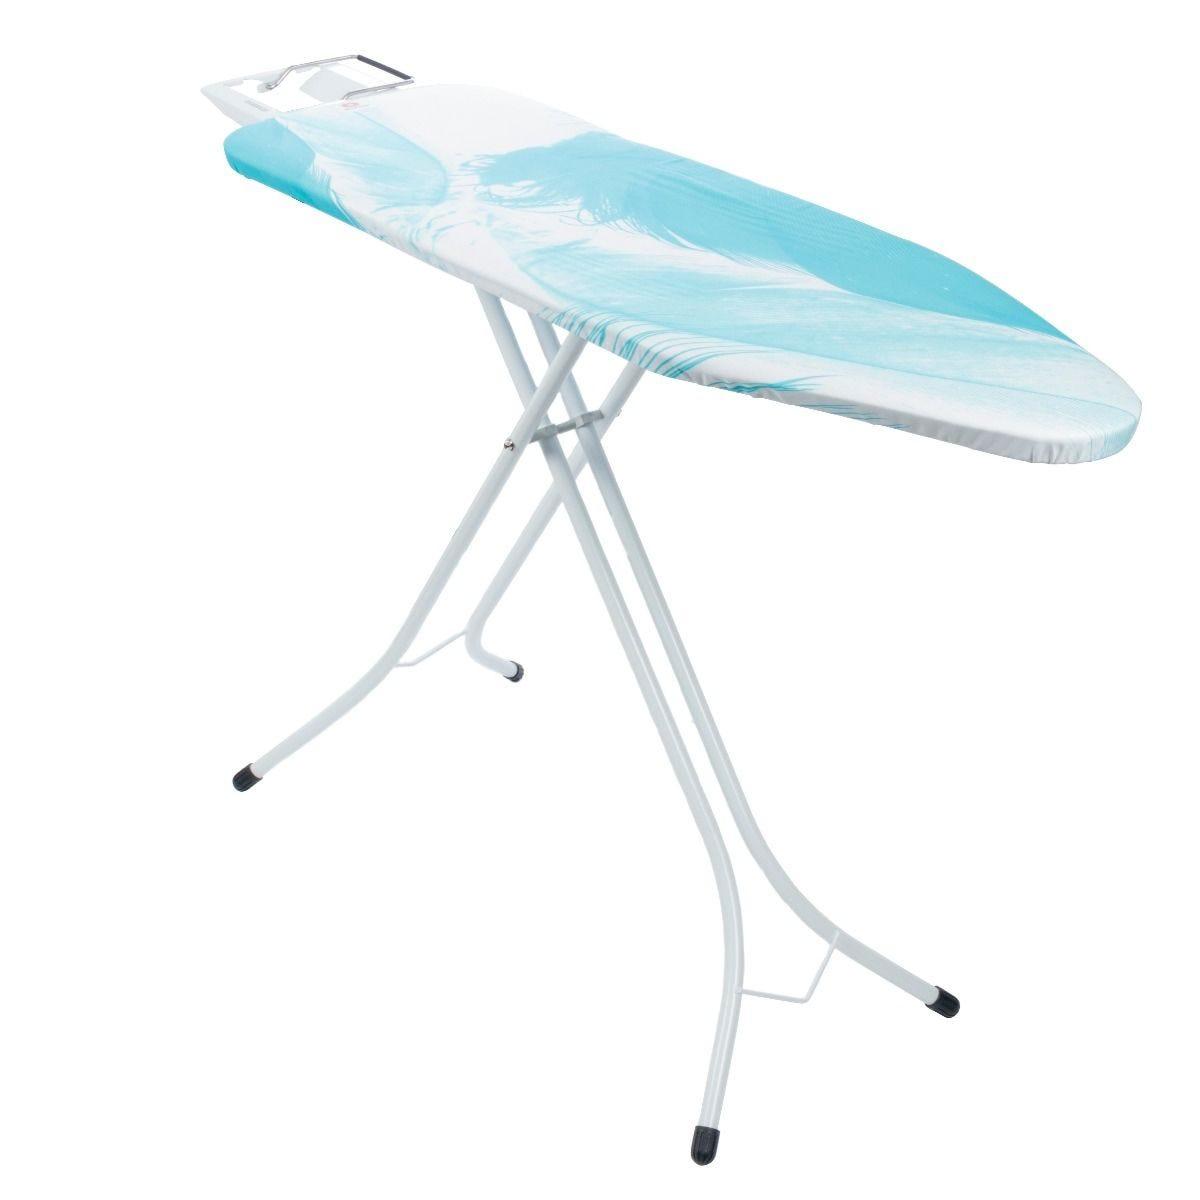 Brabantia Ironing Board - Feather